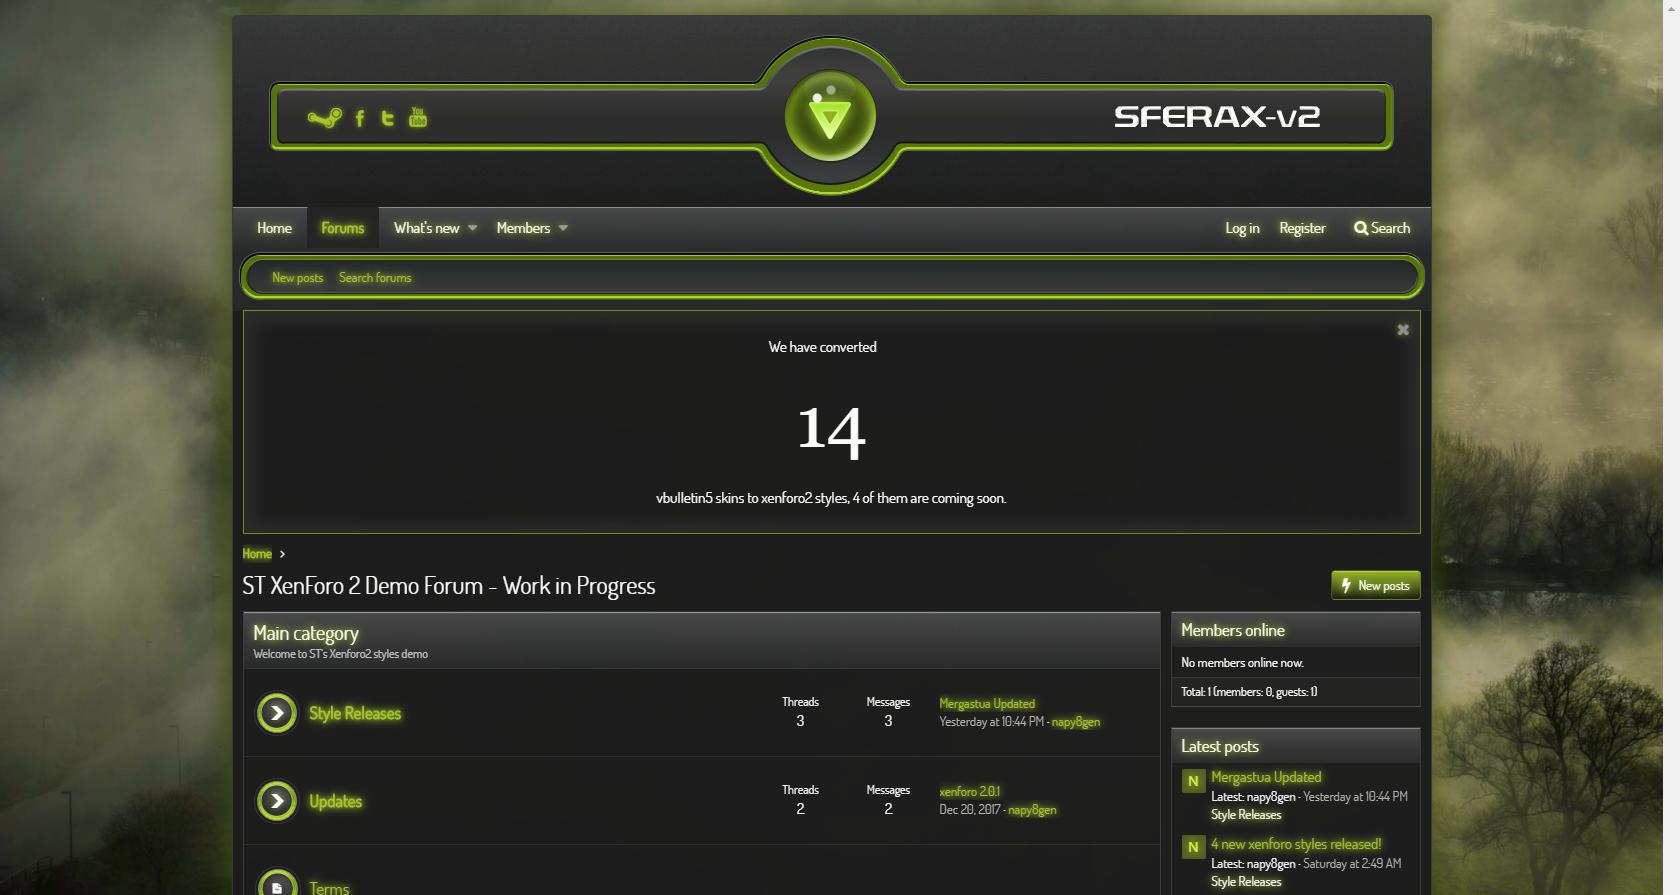 sferaxv2g - Sferax v2 Green xf2